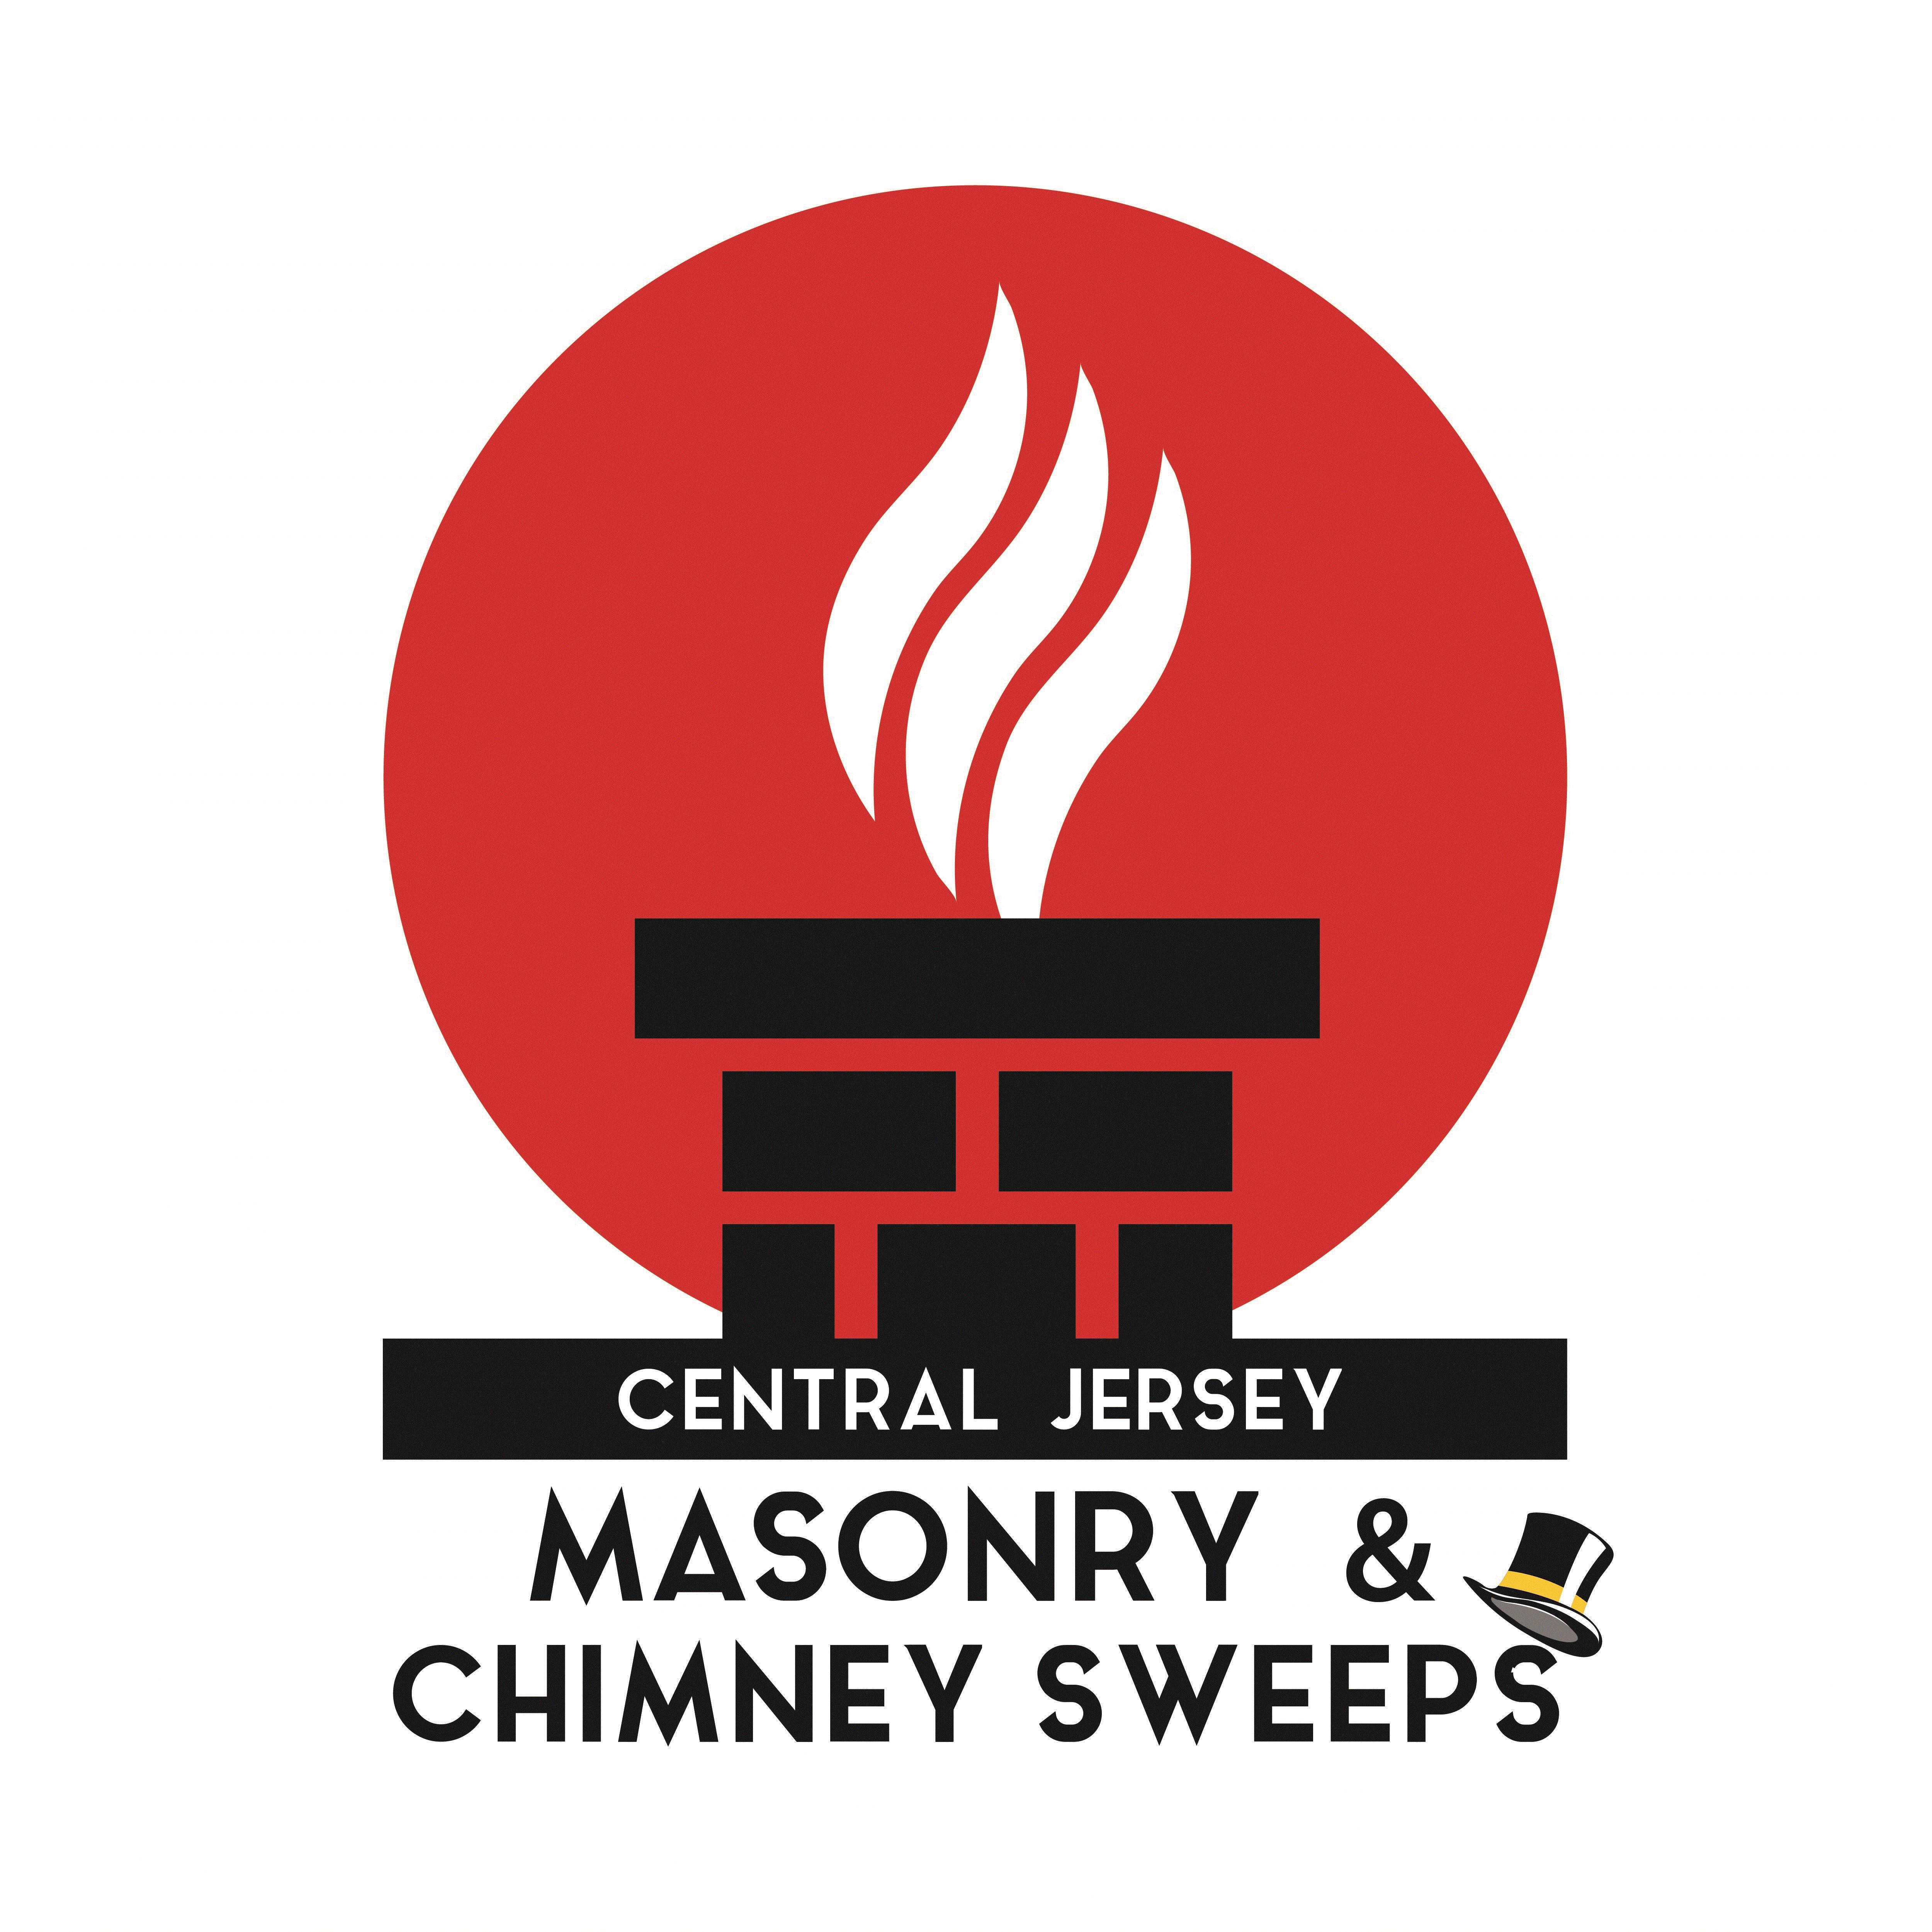 Central Jersey Masonry & Chimney Sweeps Logo